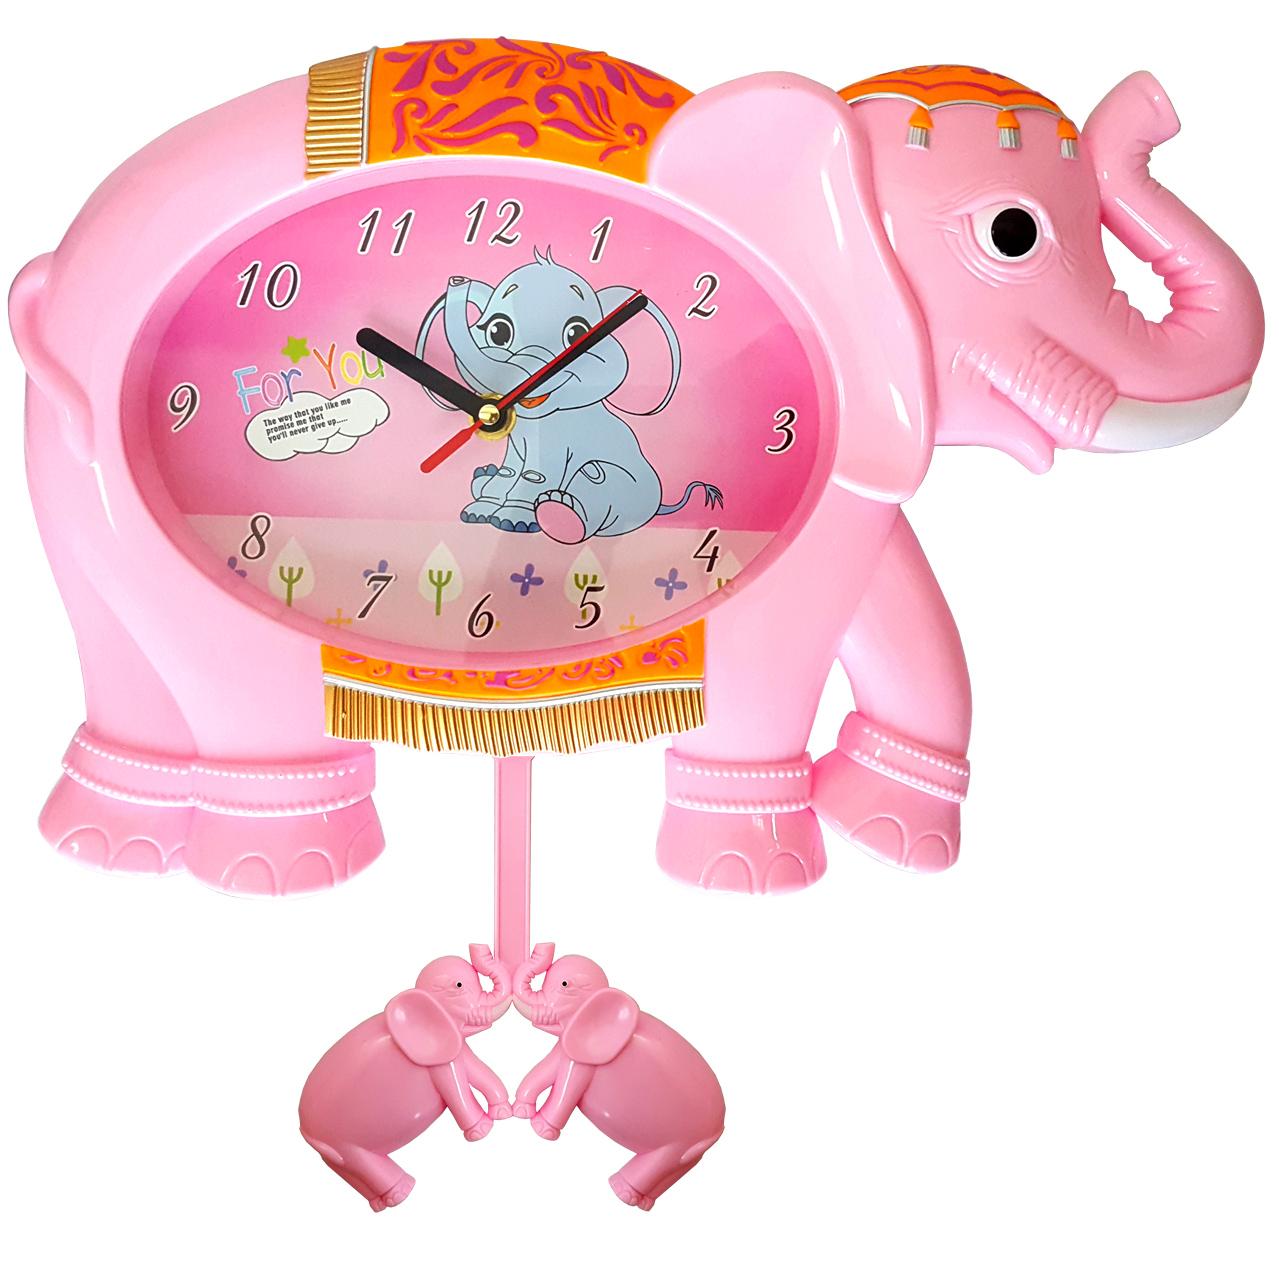 ساعت دیواری کودک طرح فیل